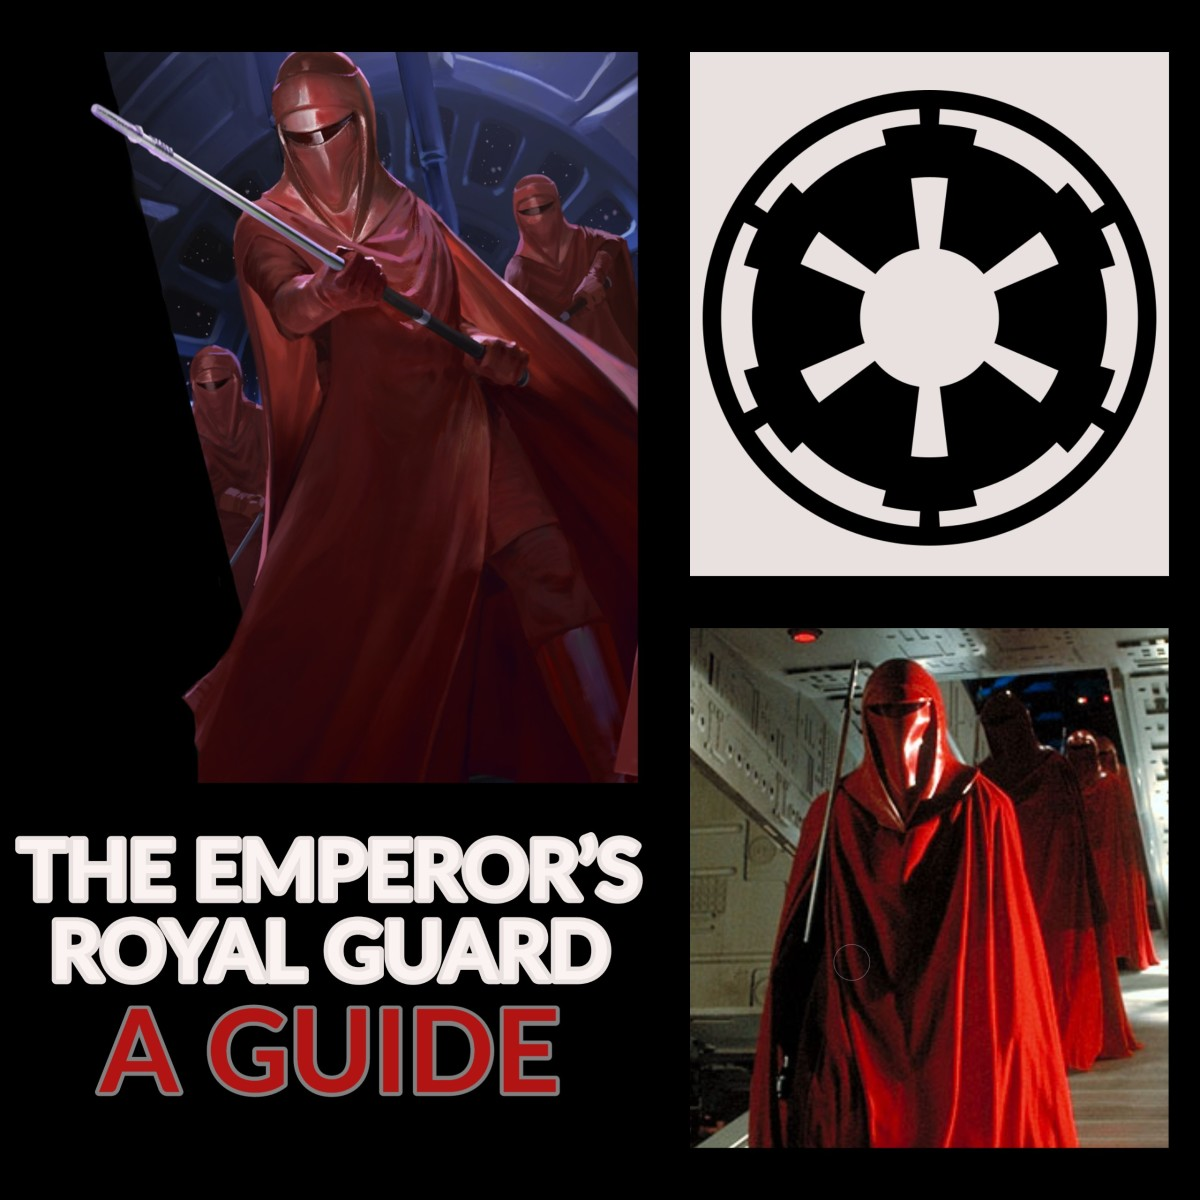 The Emperor's Royal Guard: A Guide